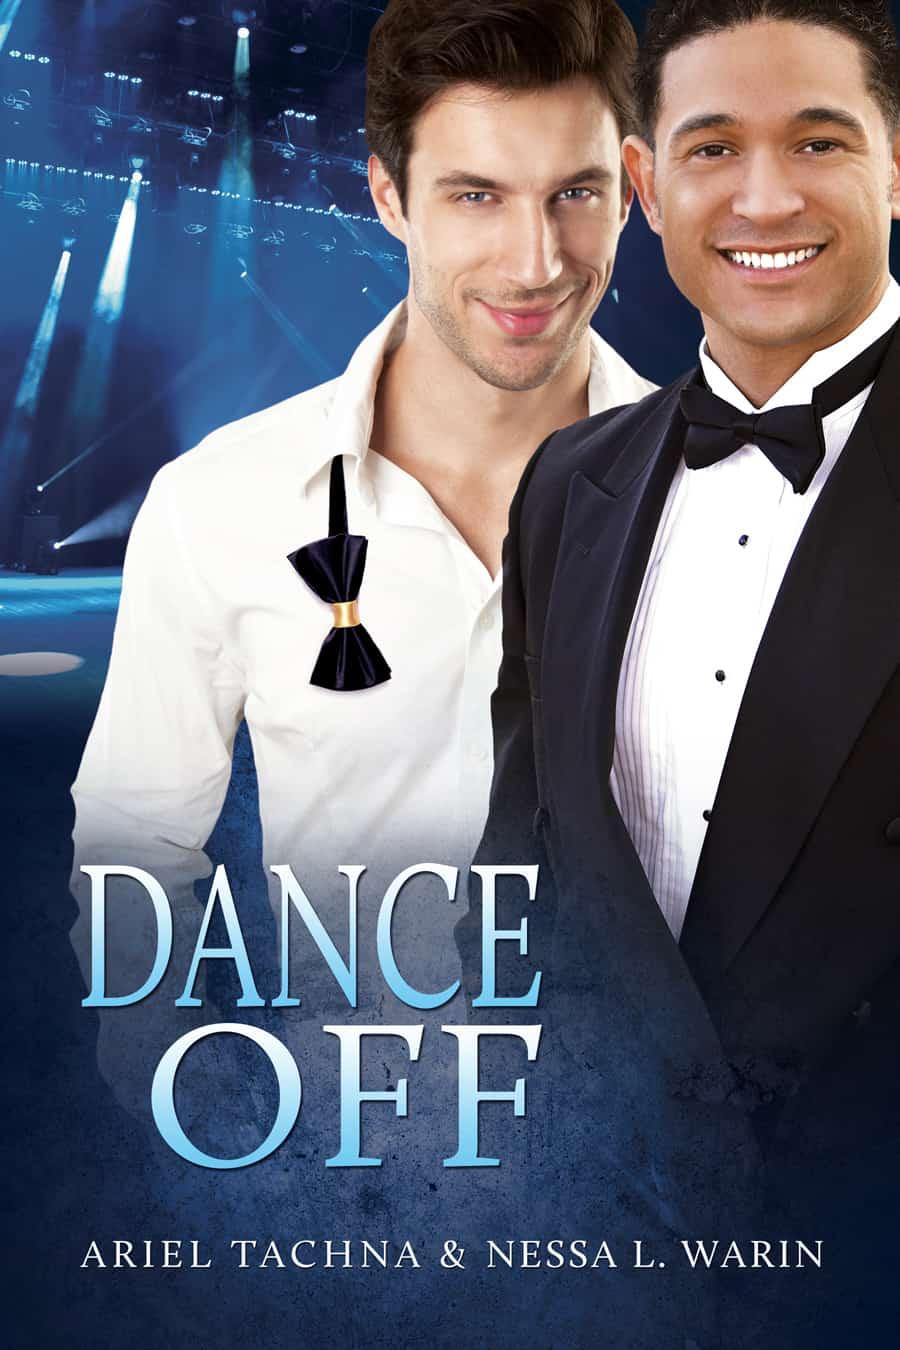 Dance Off By Ariel Tachna and Nessa L. Warin